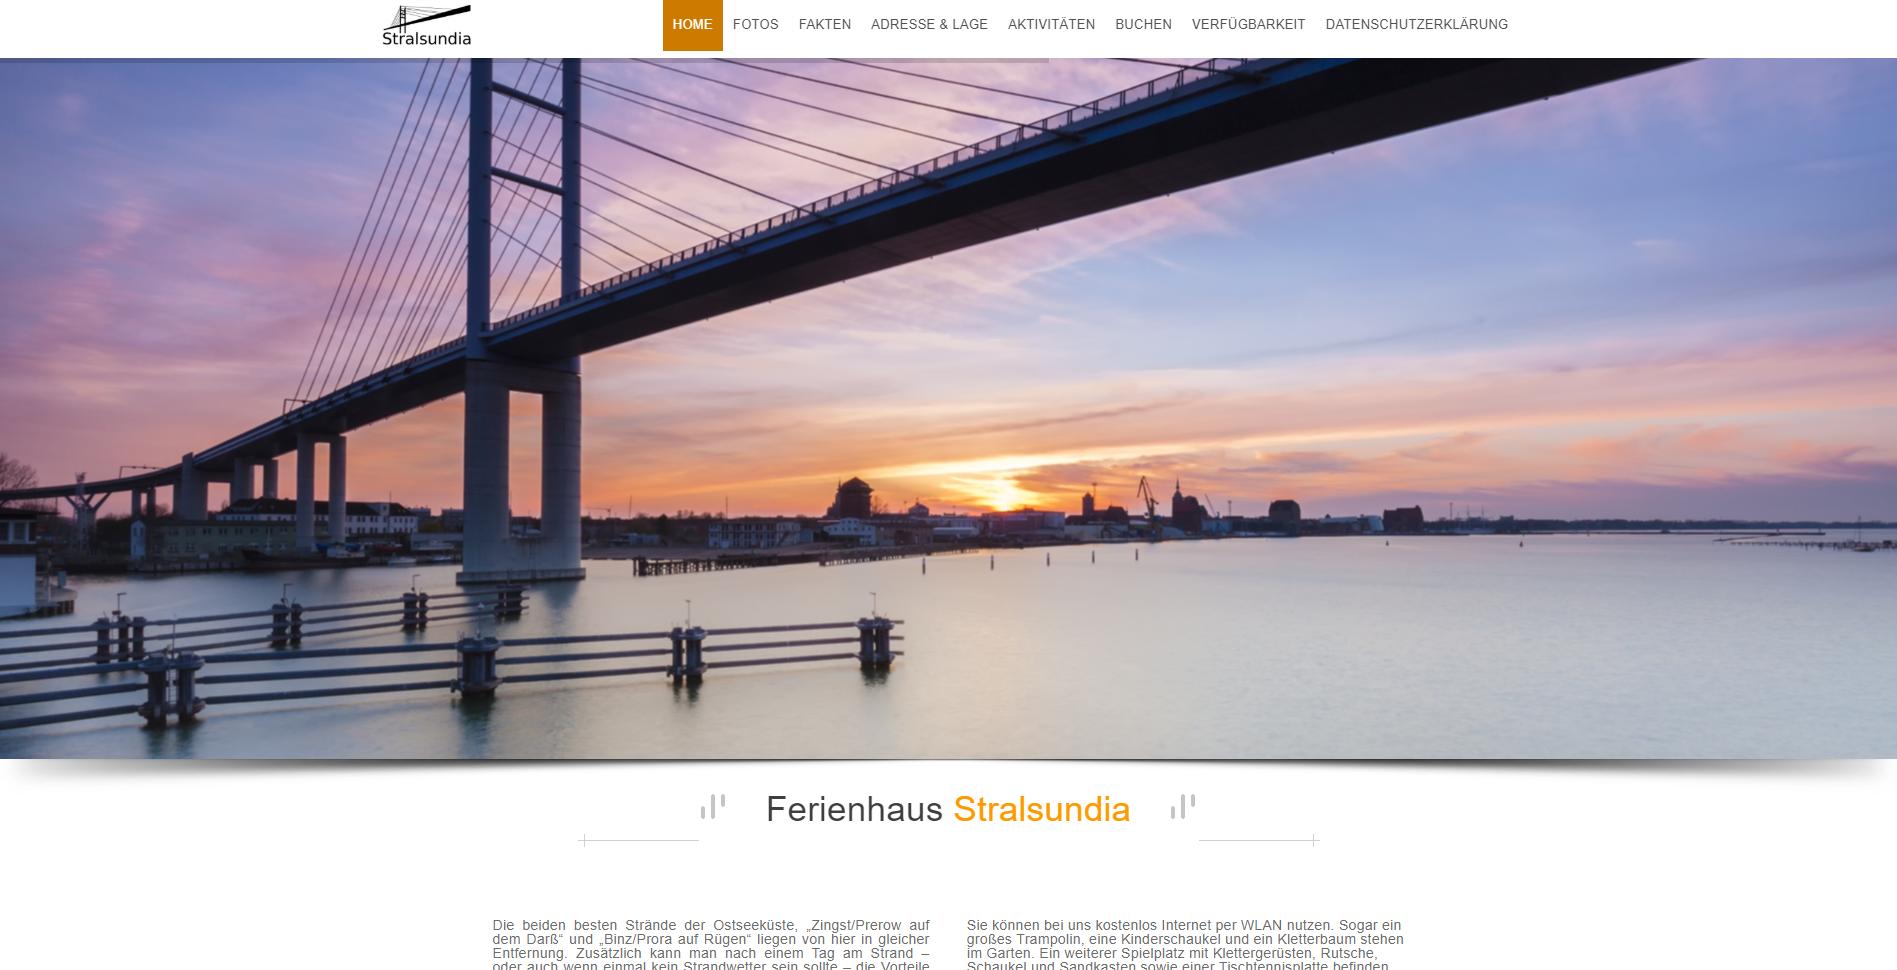 Ferienhaus Stralsundia